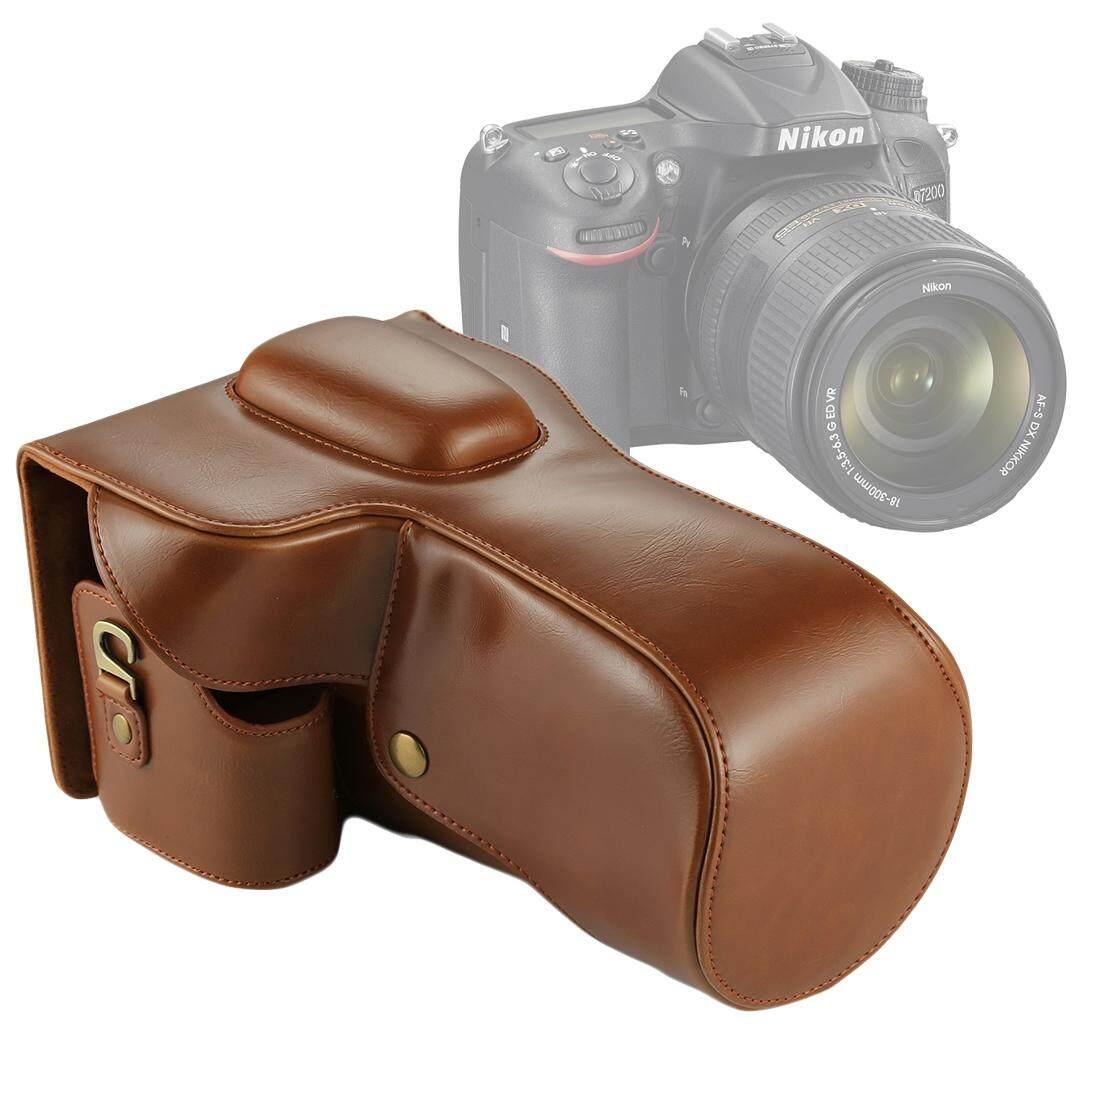 Full Body Camera PU Leather Case Bag for Nikon D7200 / D7100 / D7000 (18-200 / 18-140mm Lens) (Brown) - intl